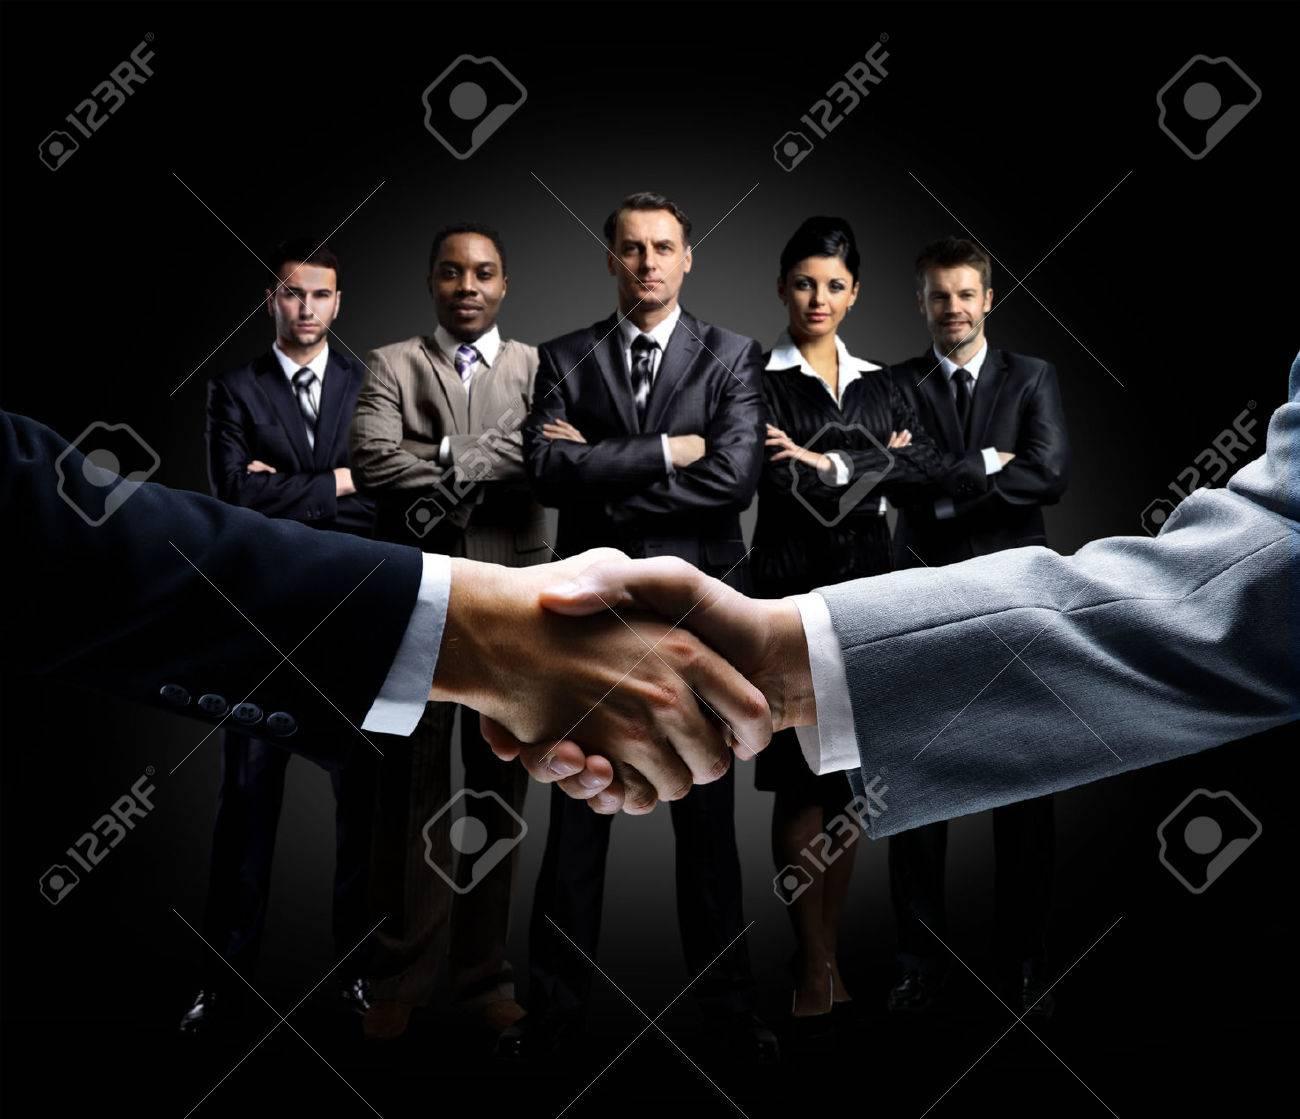 handshake isolated on business background Standard-Bild - 52955422